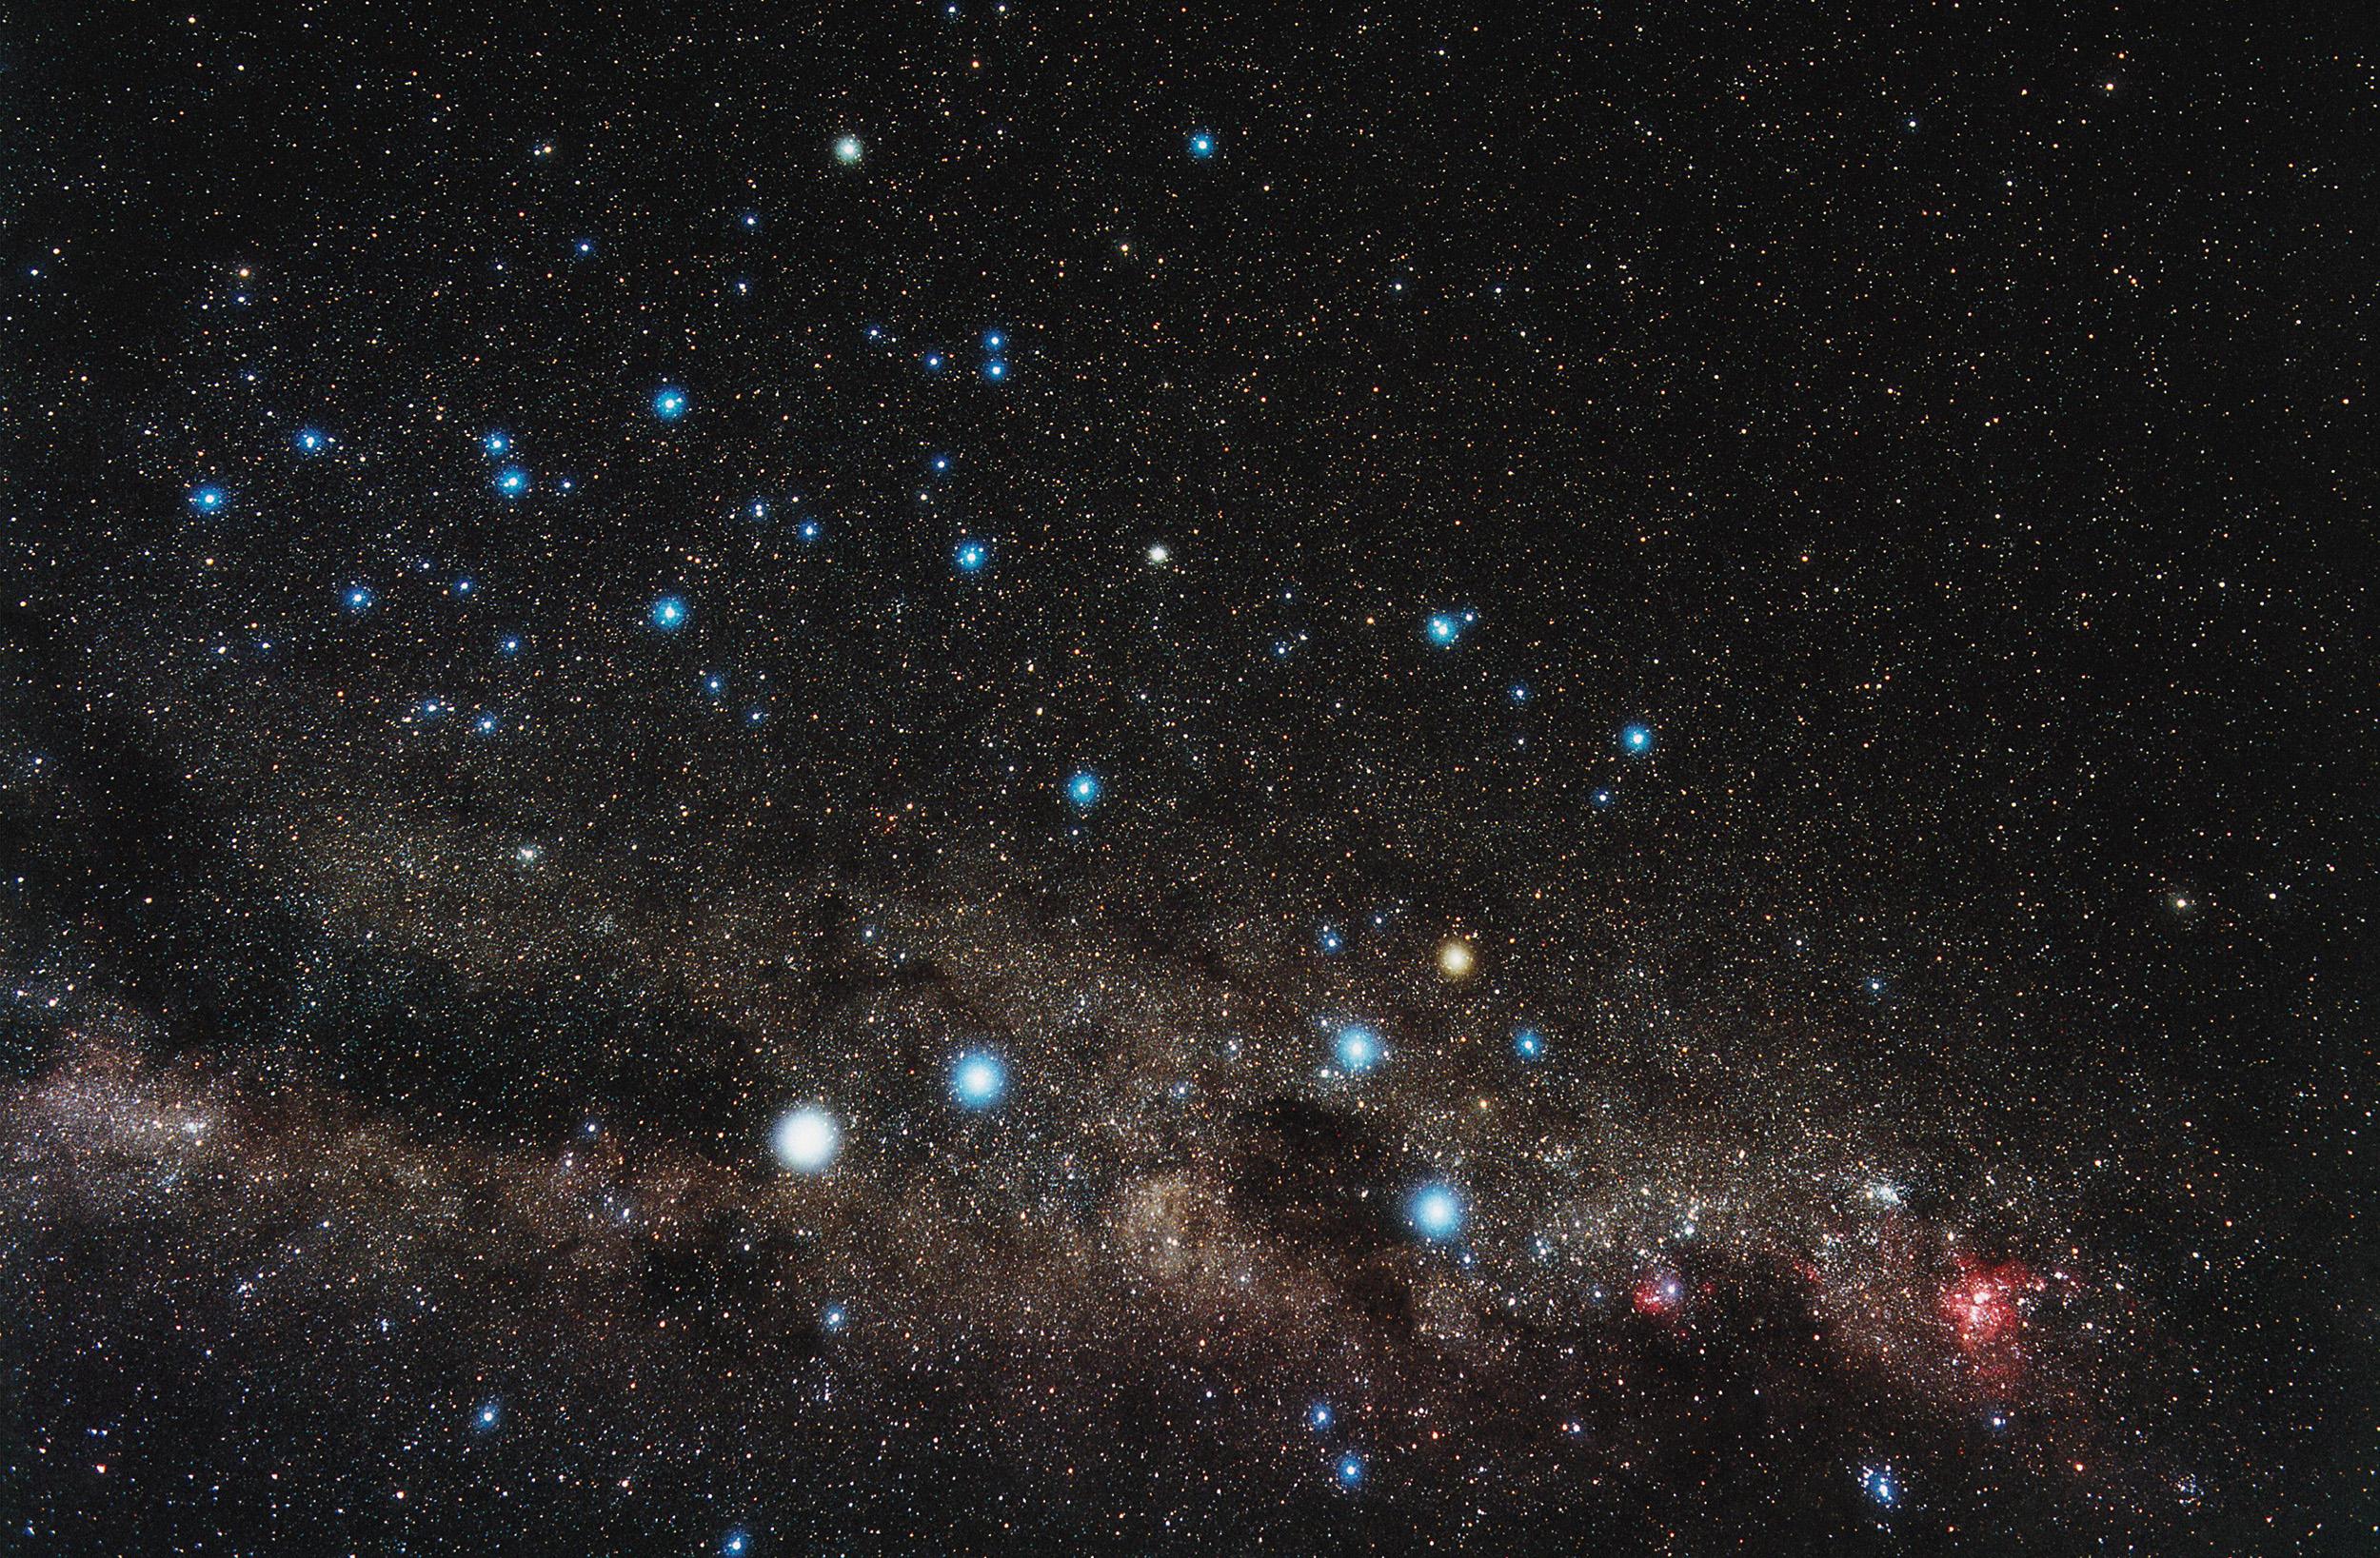 Image: Centaurus constellation